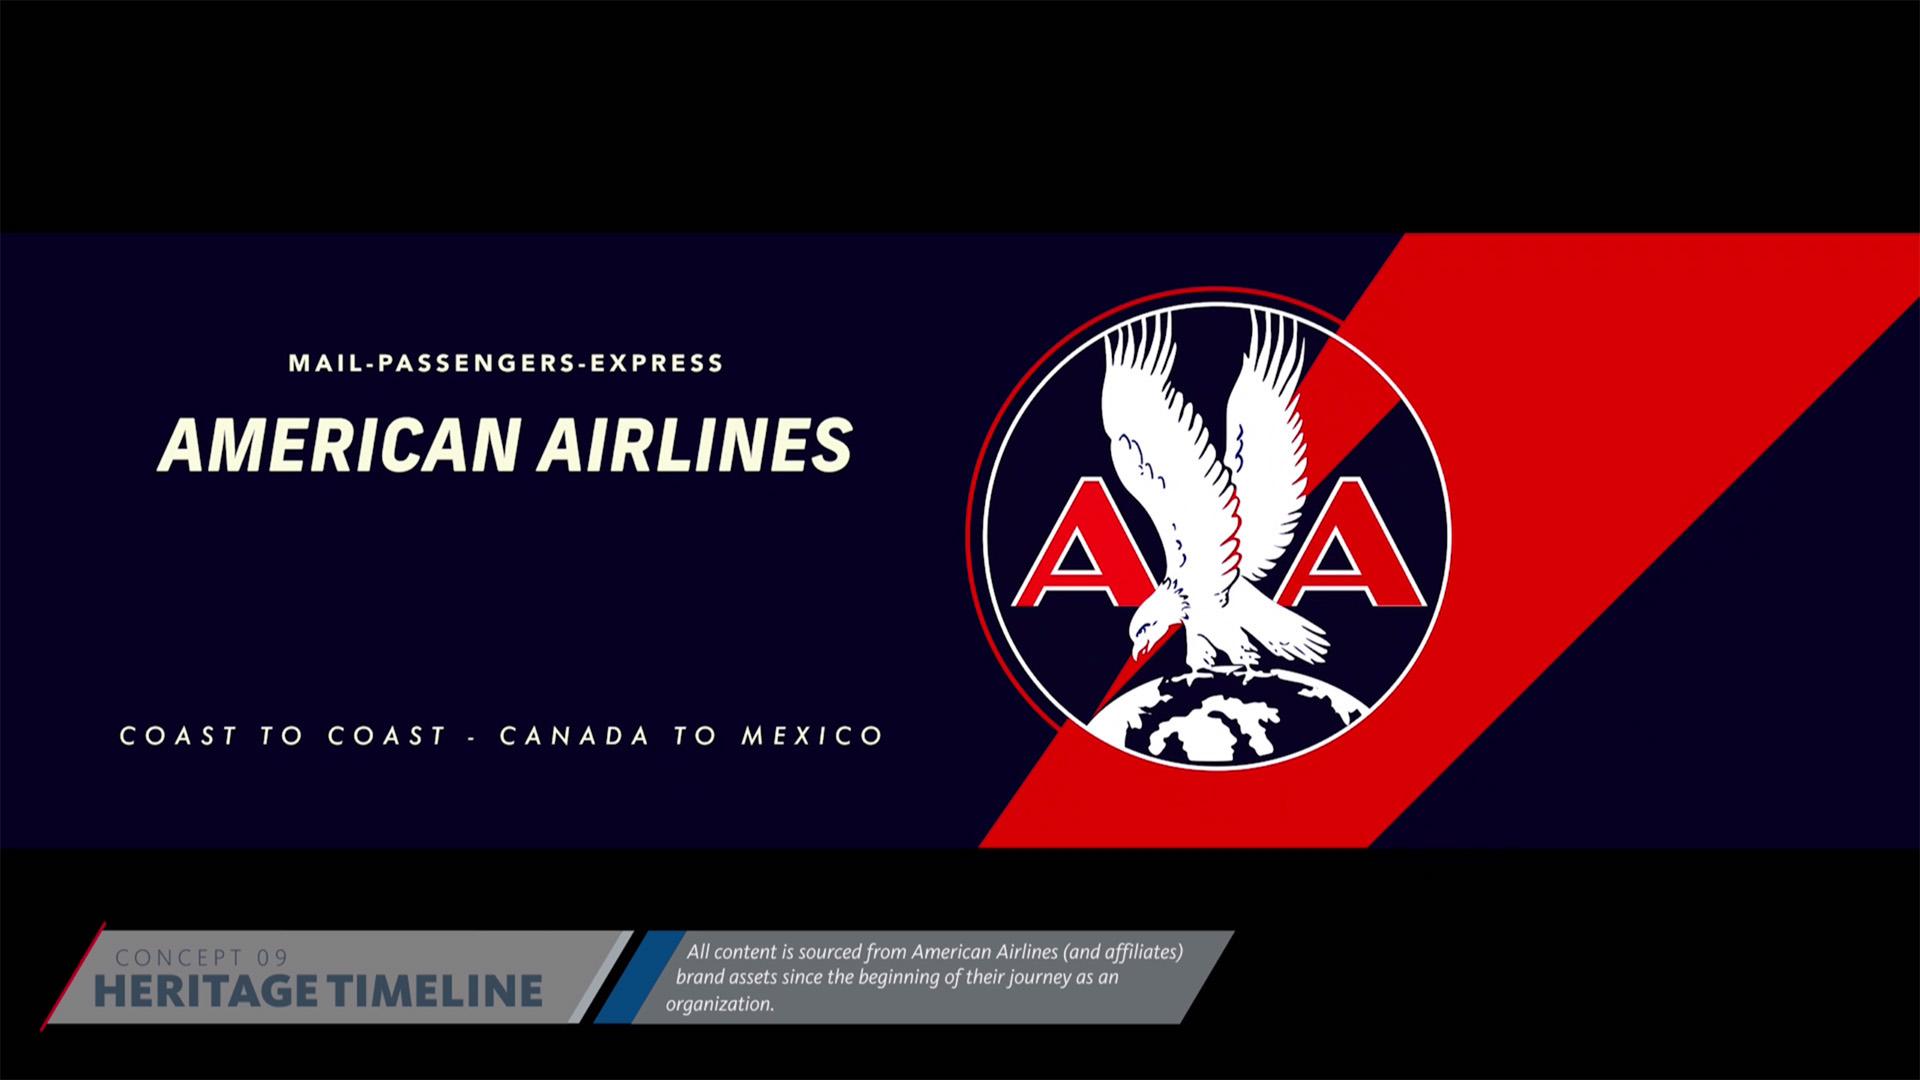 American Airlines Heritage Timeline